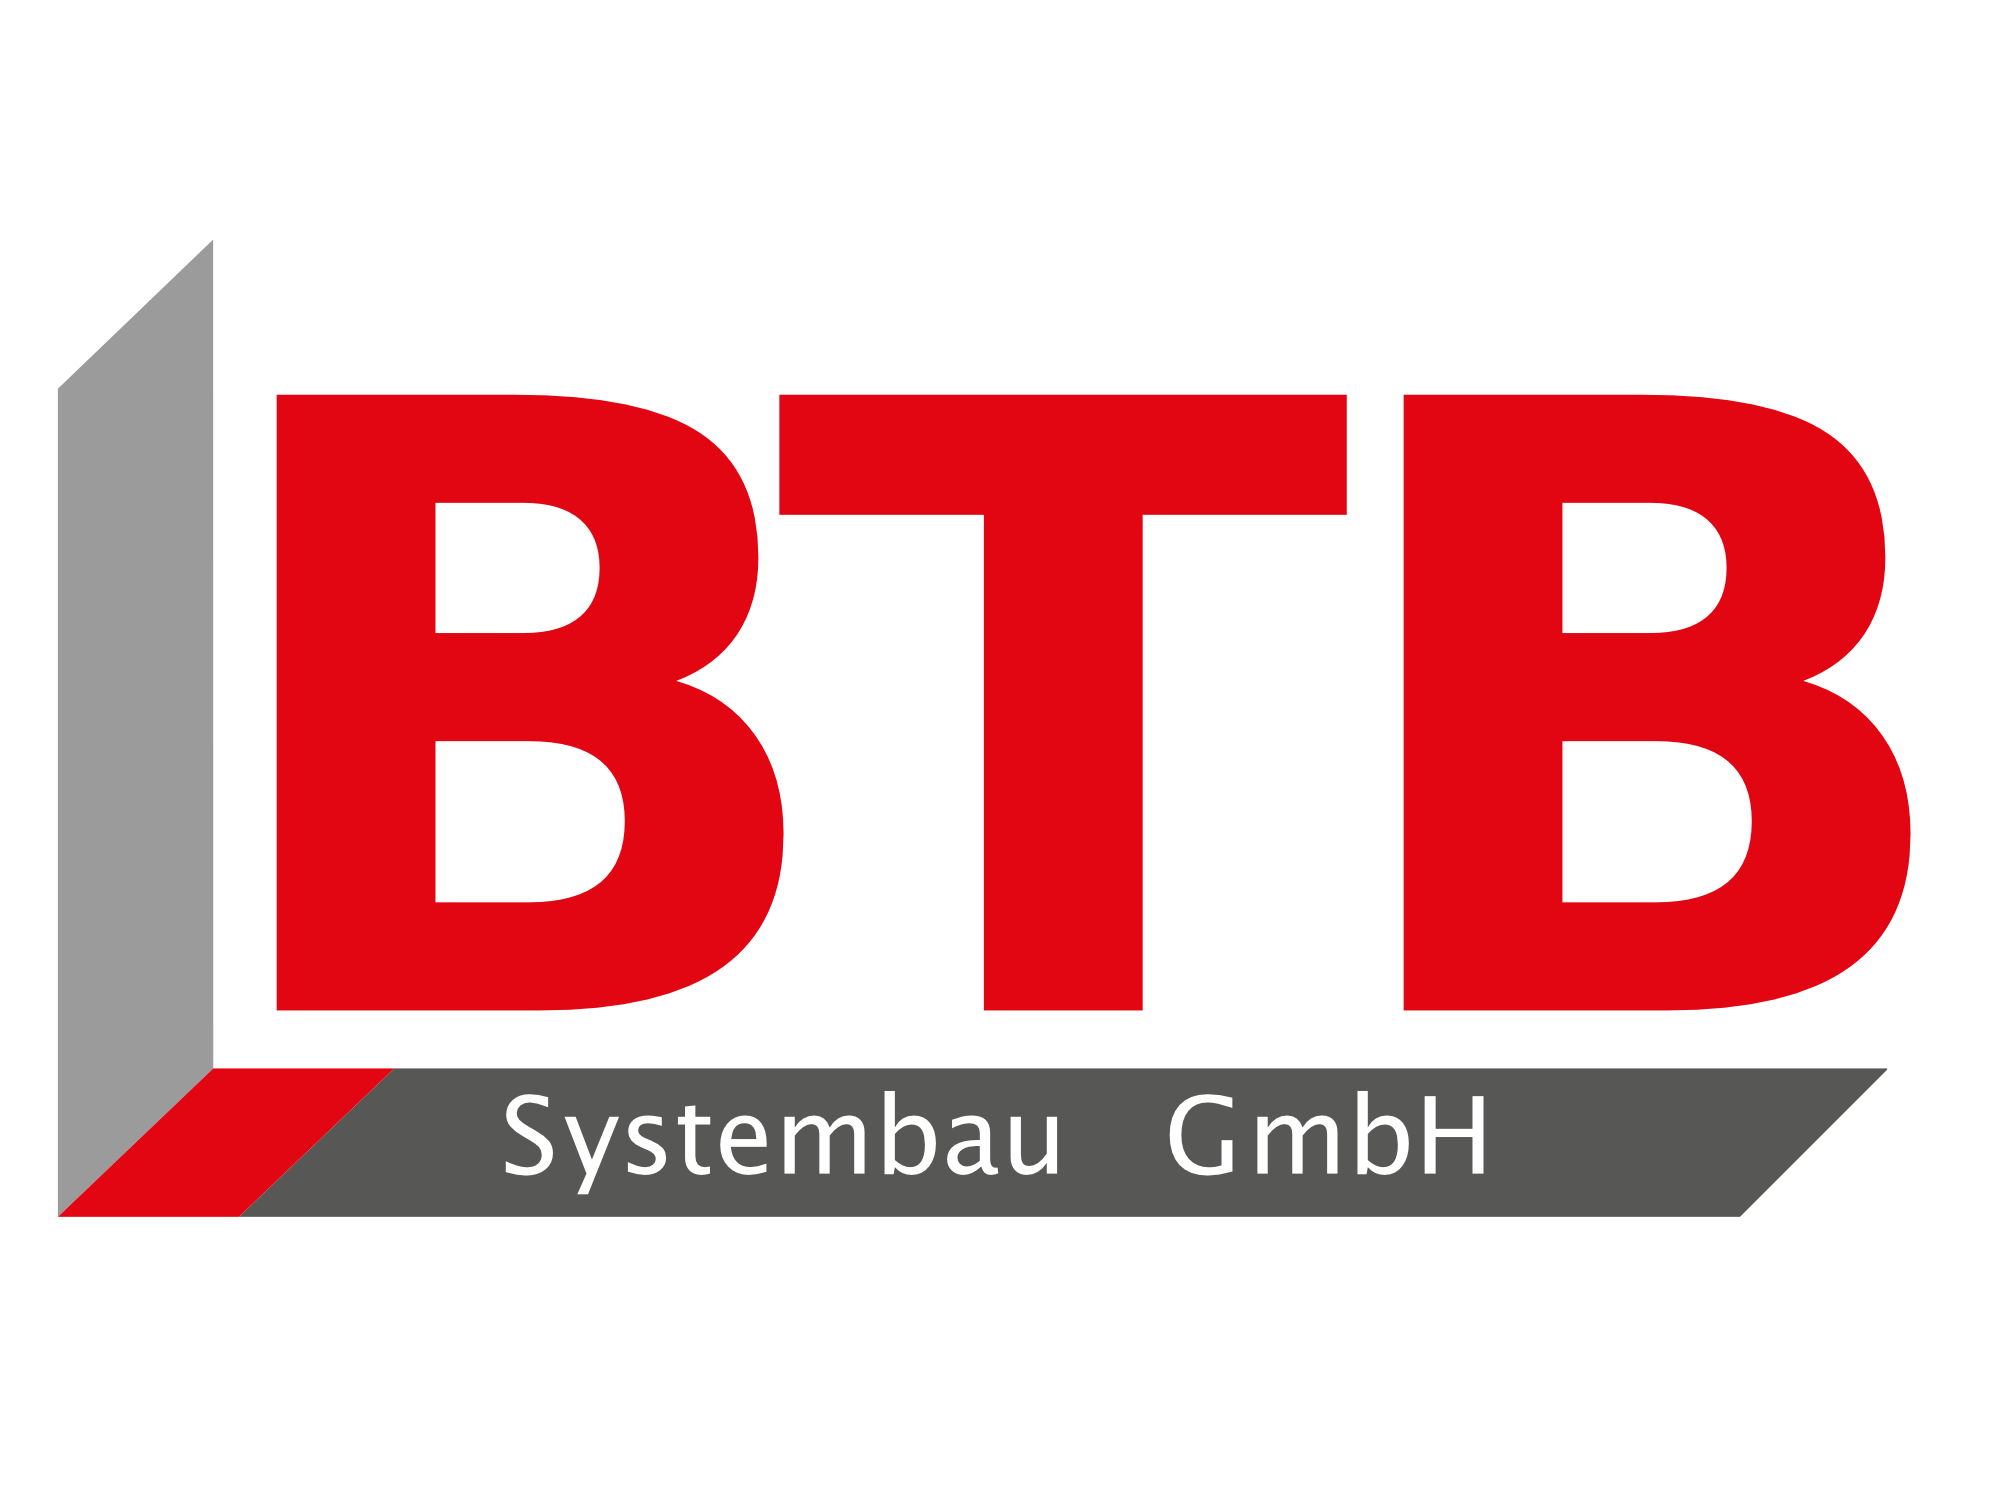 BTB-Systembau GmbH